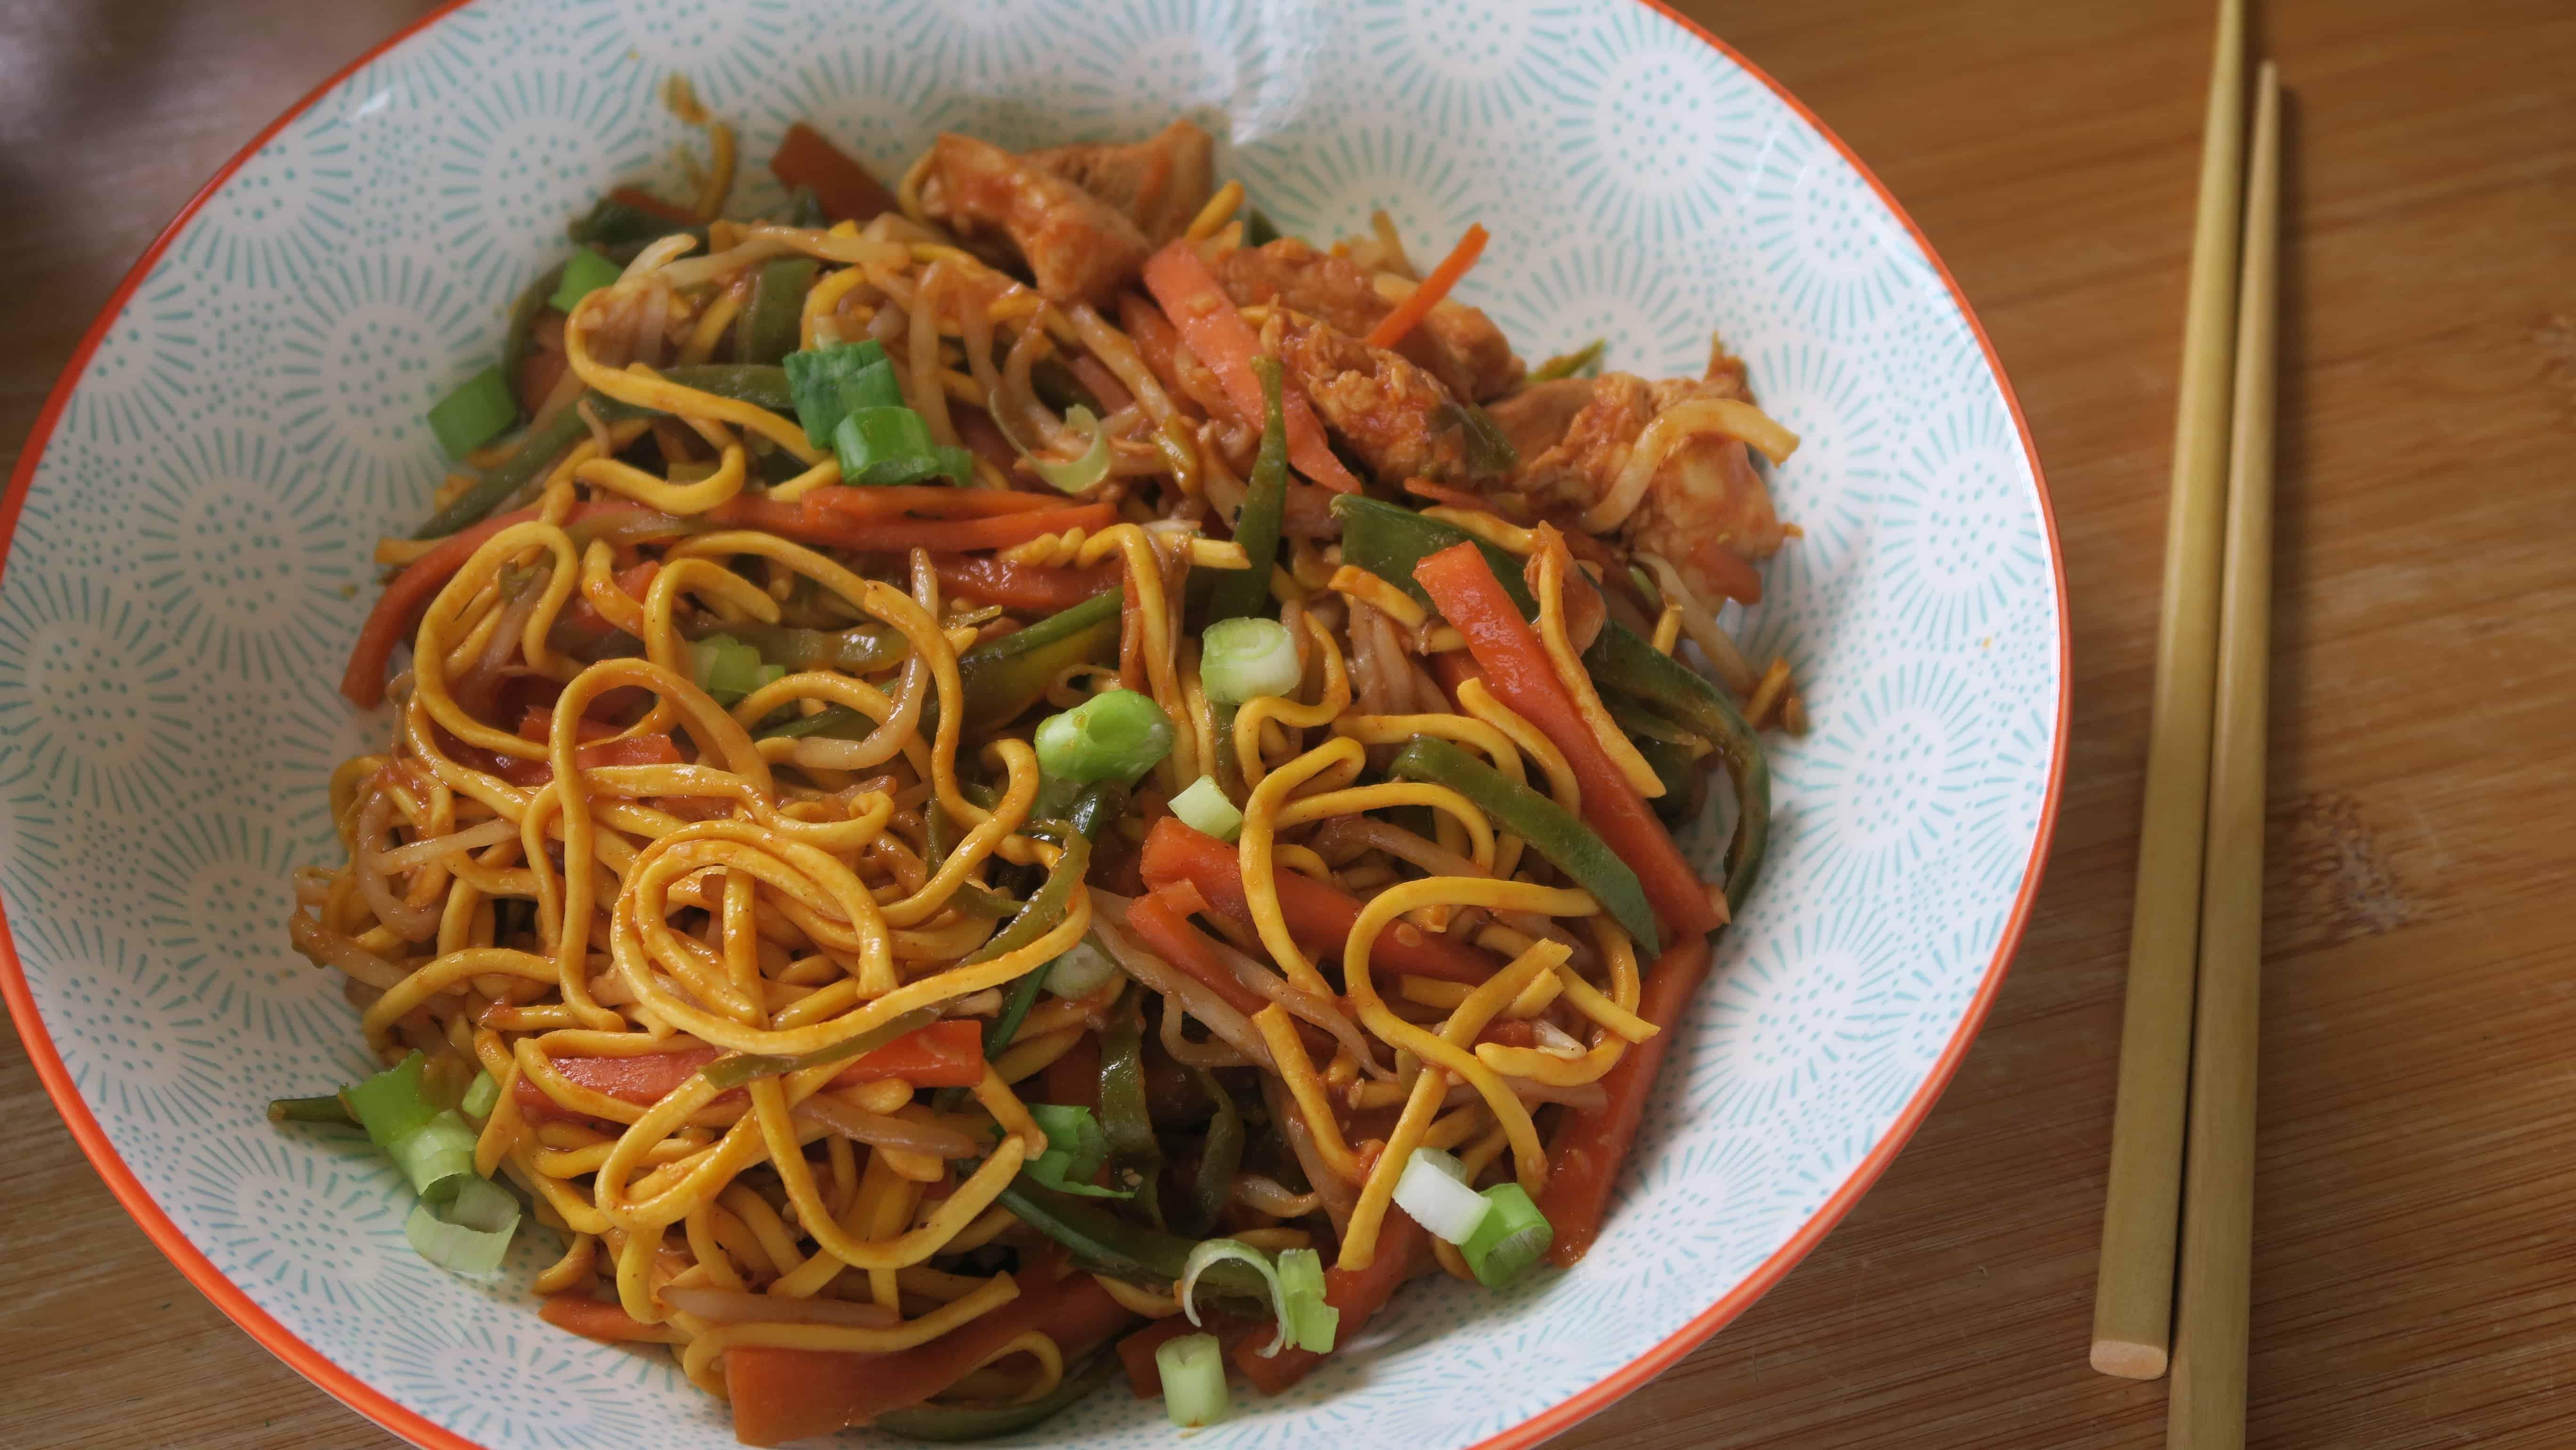 Gluten free chicken chow mein recipe - easy chow mein recipe - gluten free chow mein - gluten free chinese food - chow mein